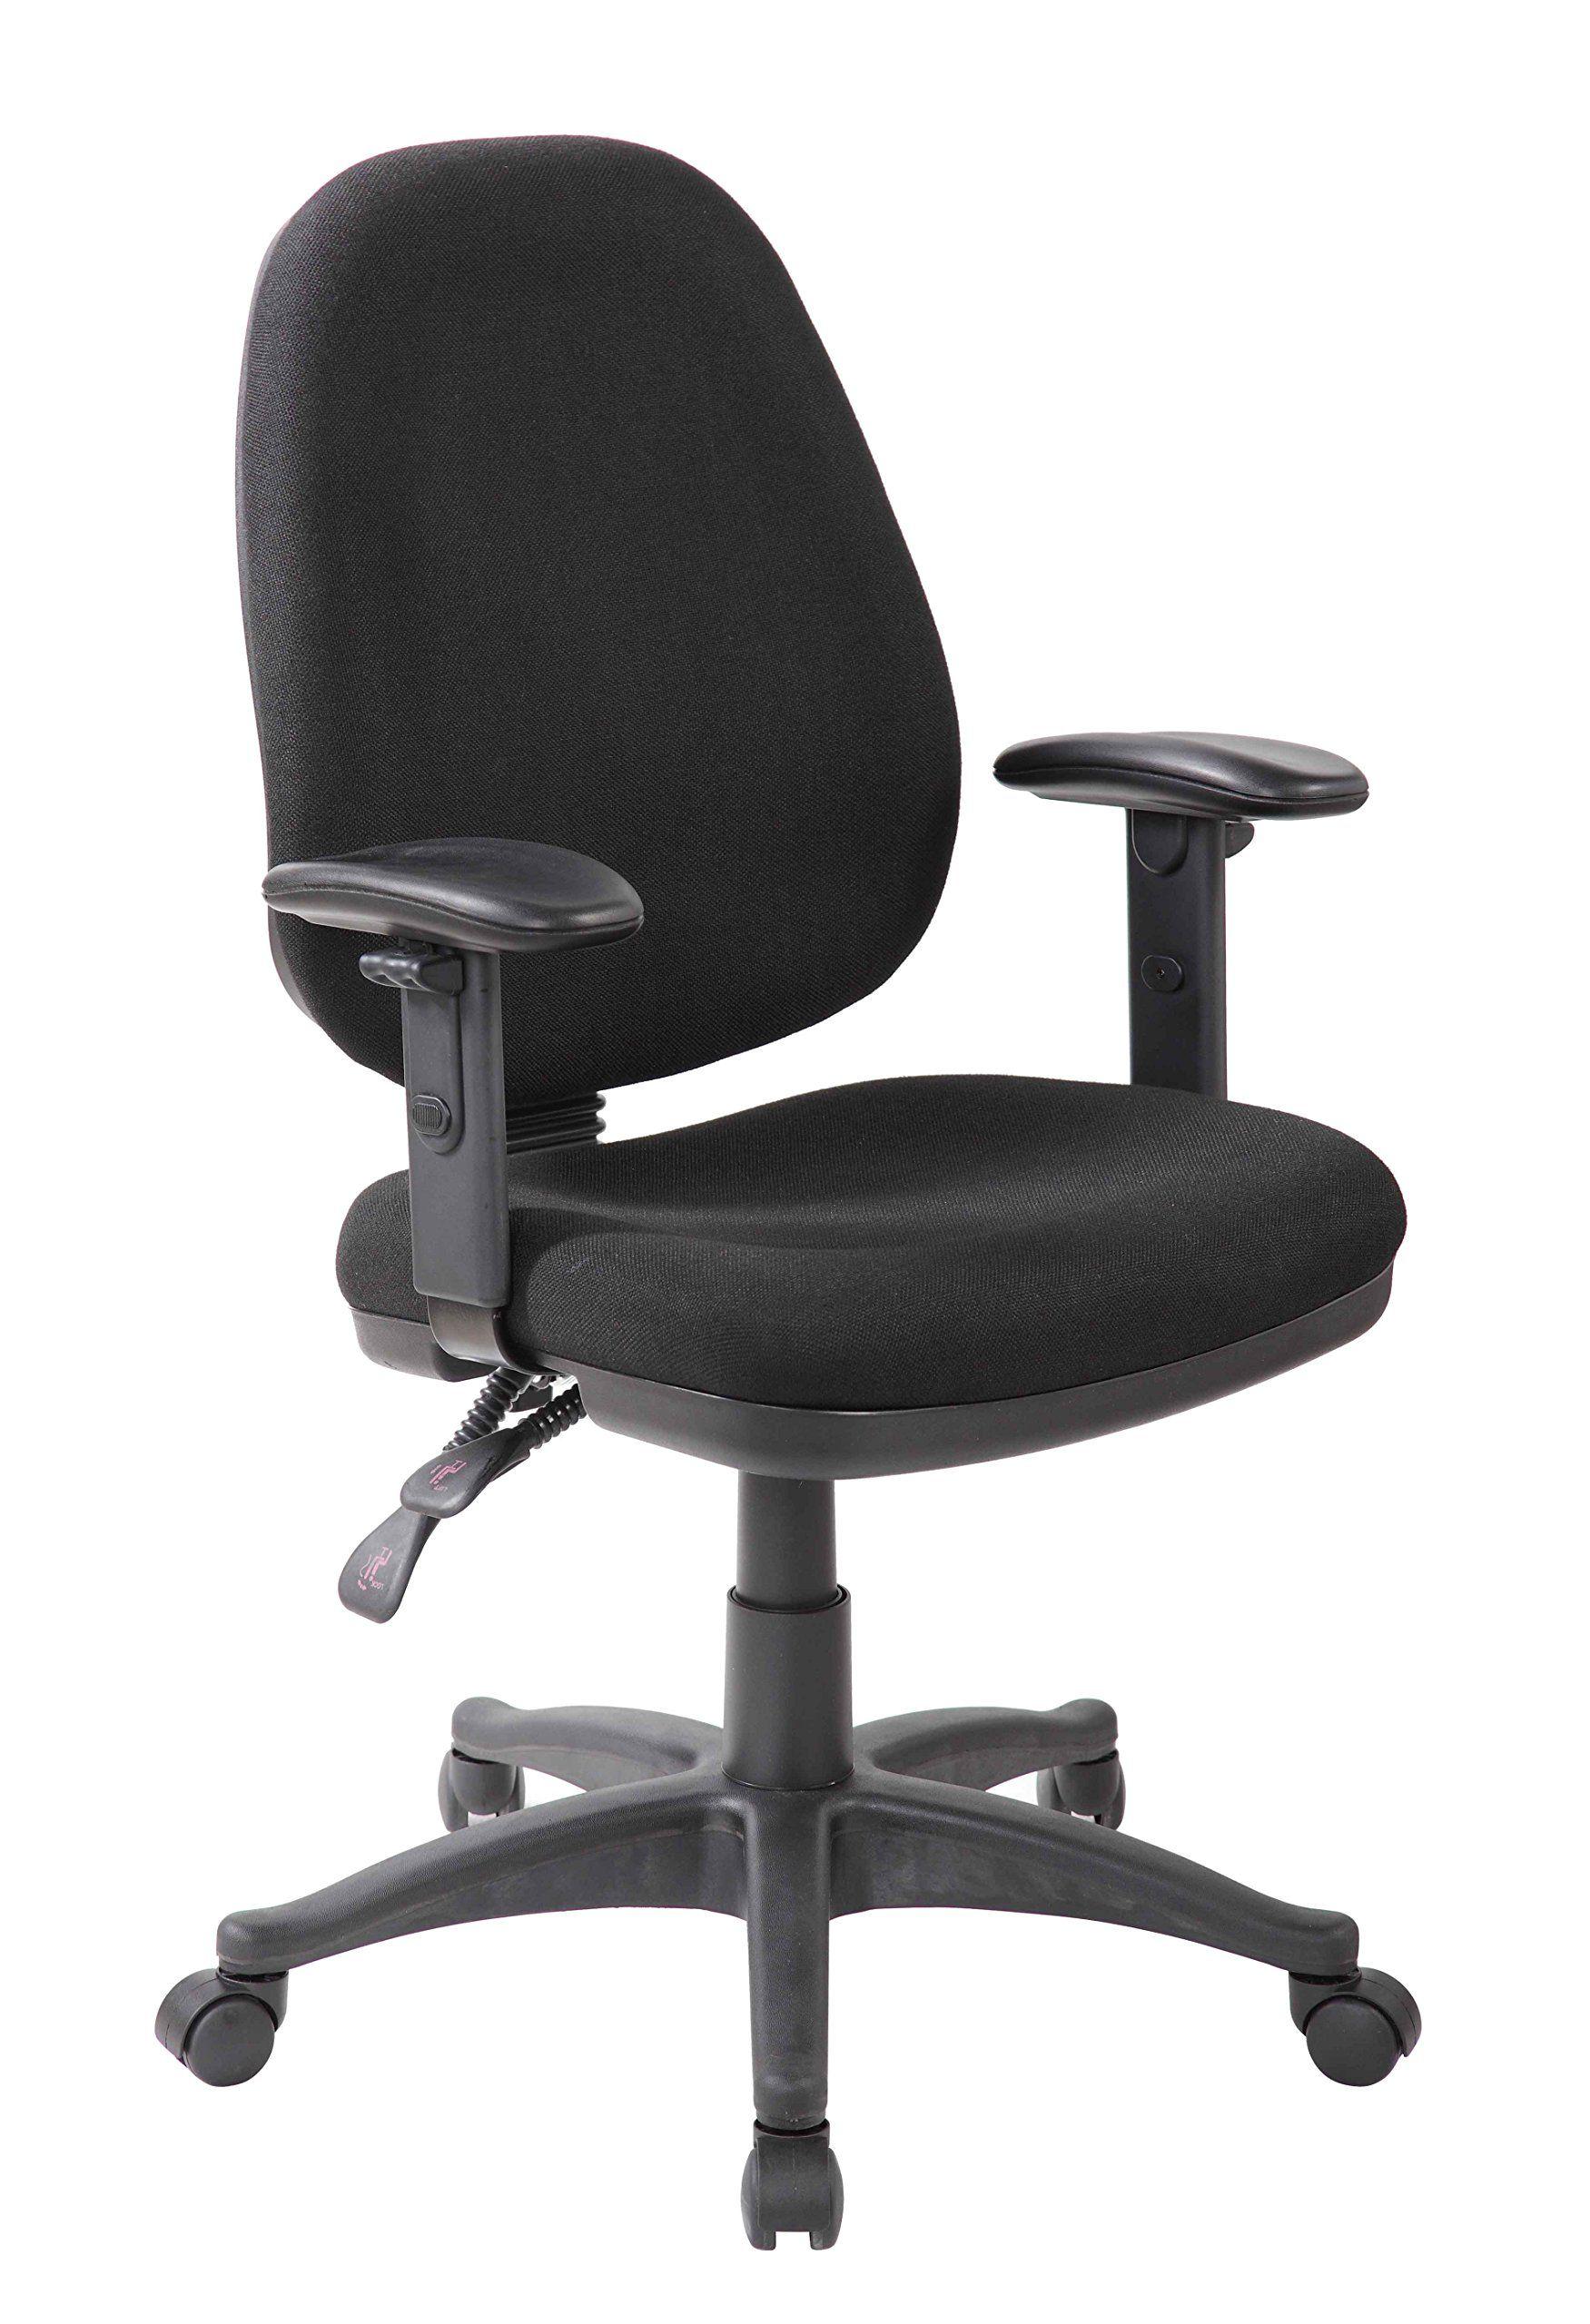 Eurosports Work Chair ES 1005 BK Ergonomic Works Drafting Chair With Arms ,Black